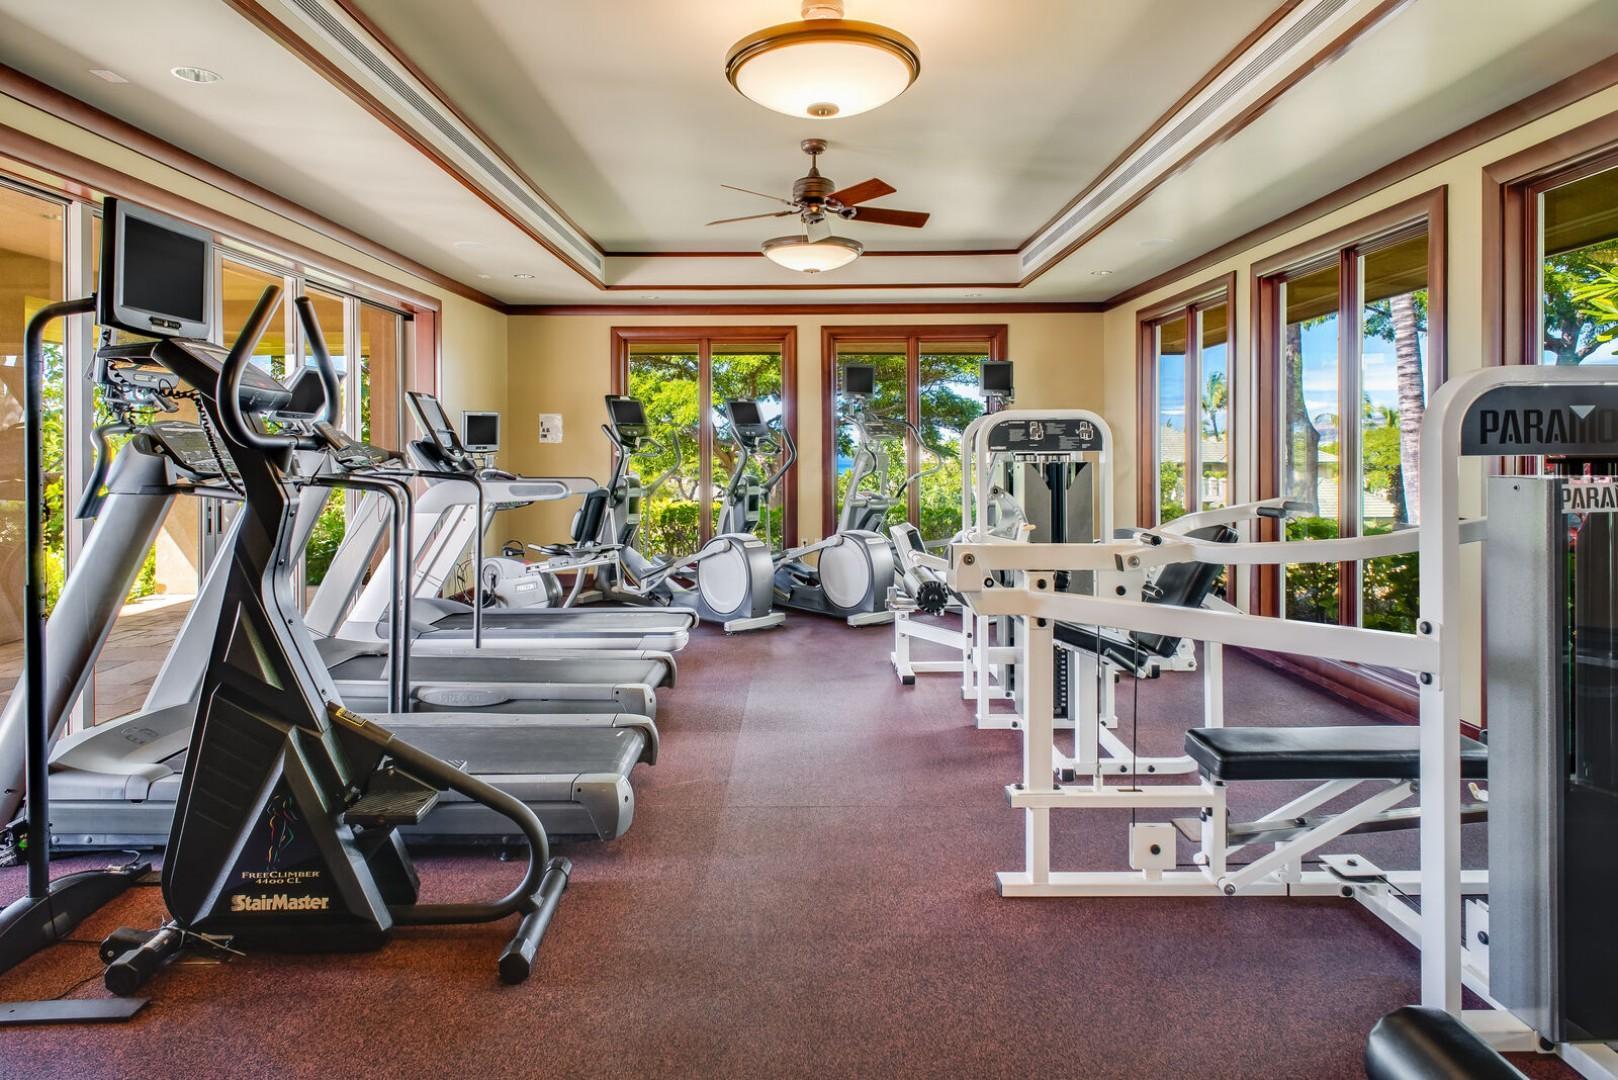 Wai'ula'ua Amenities Center: shared fitness center.